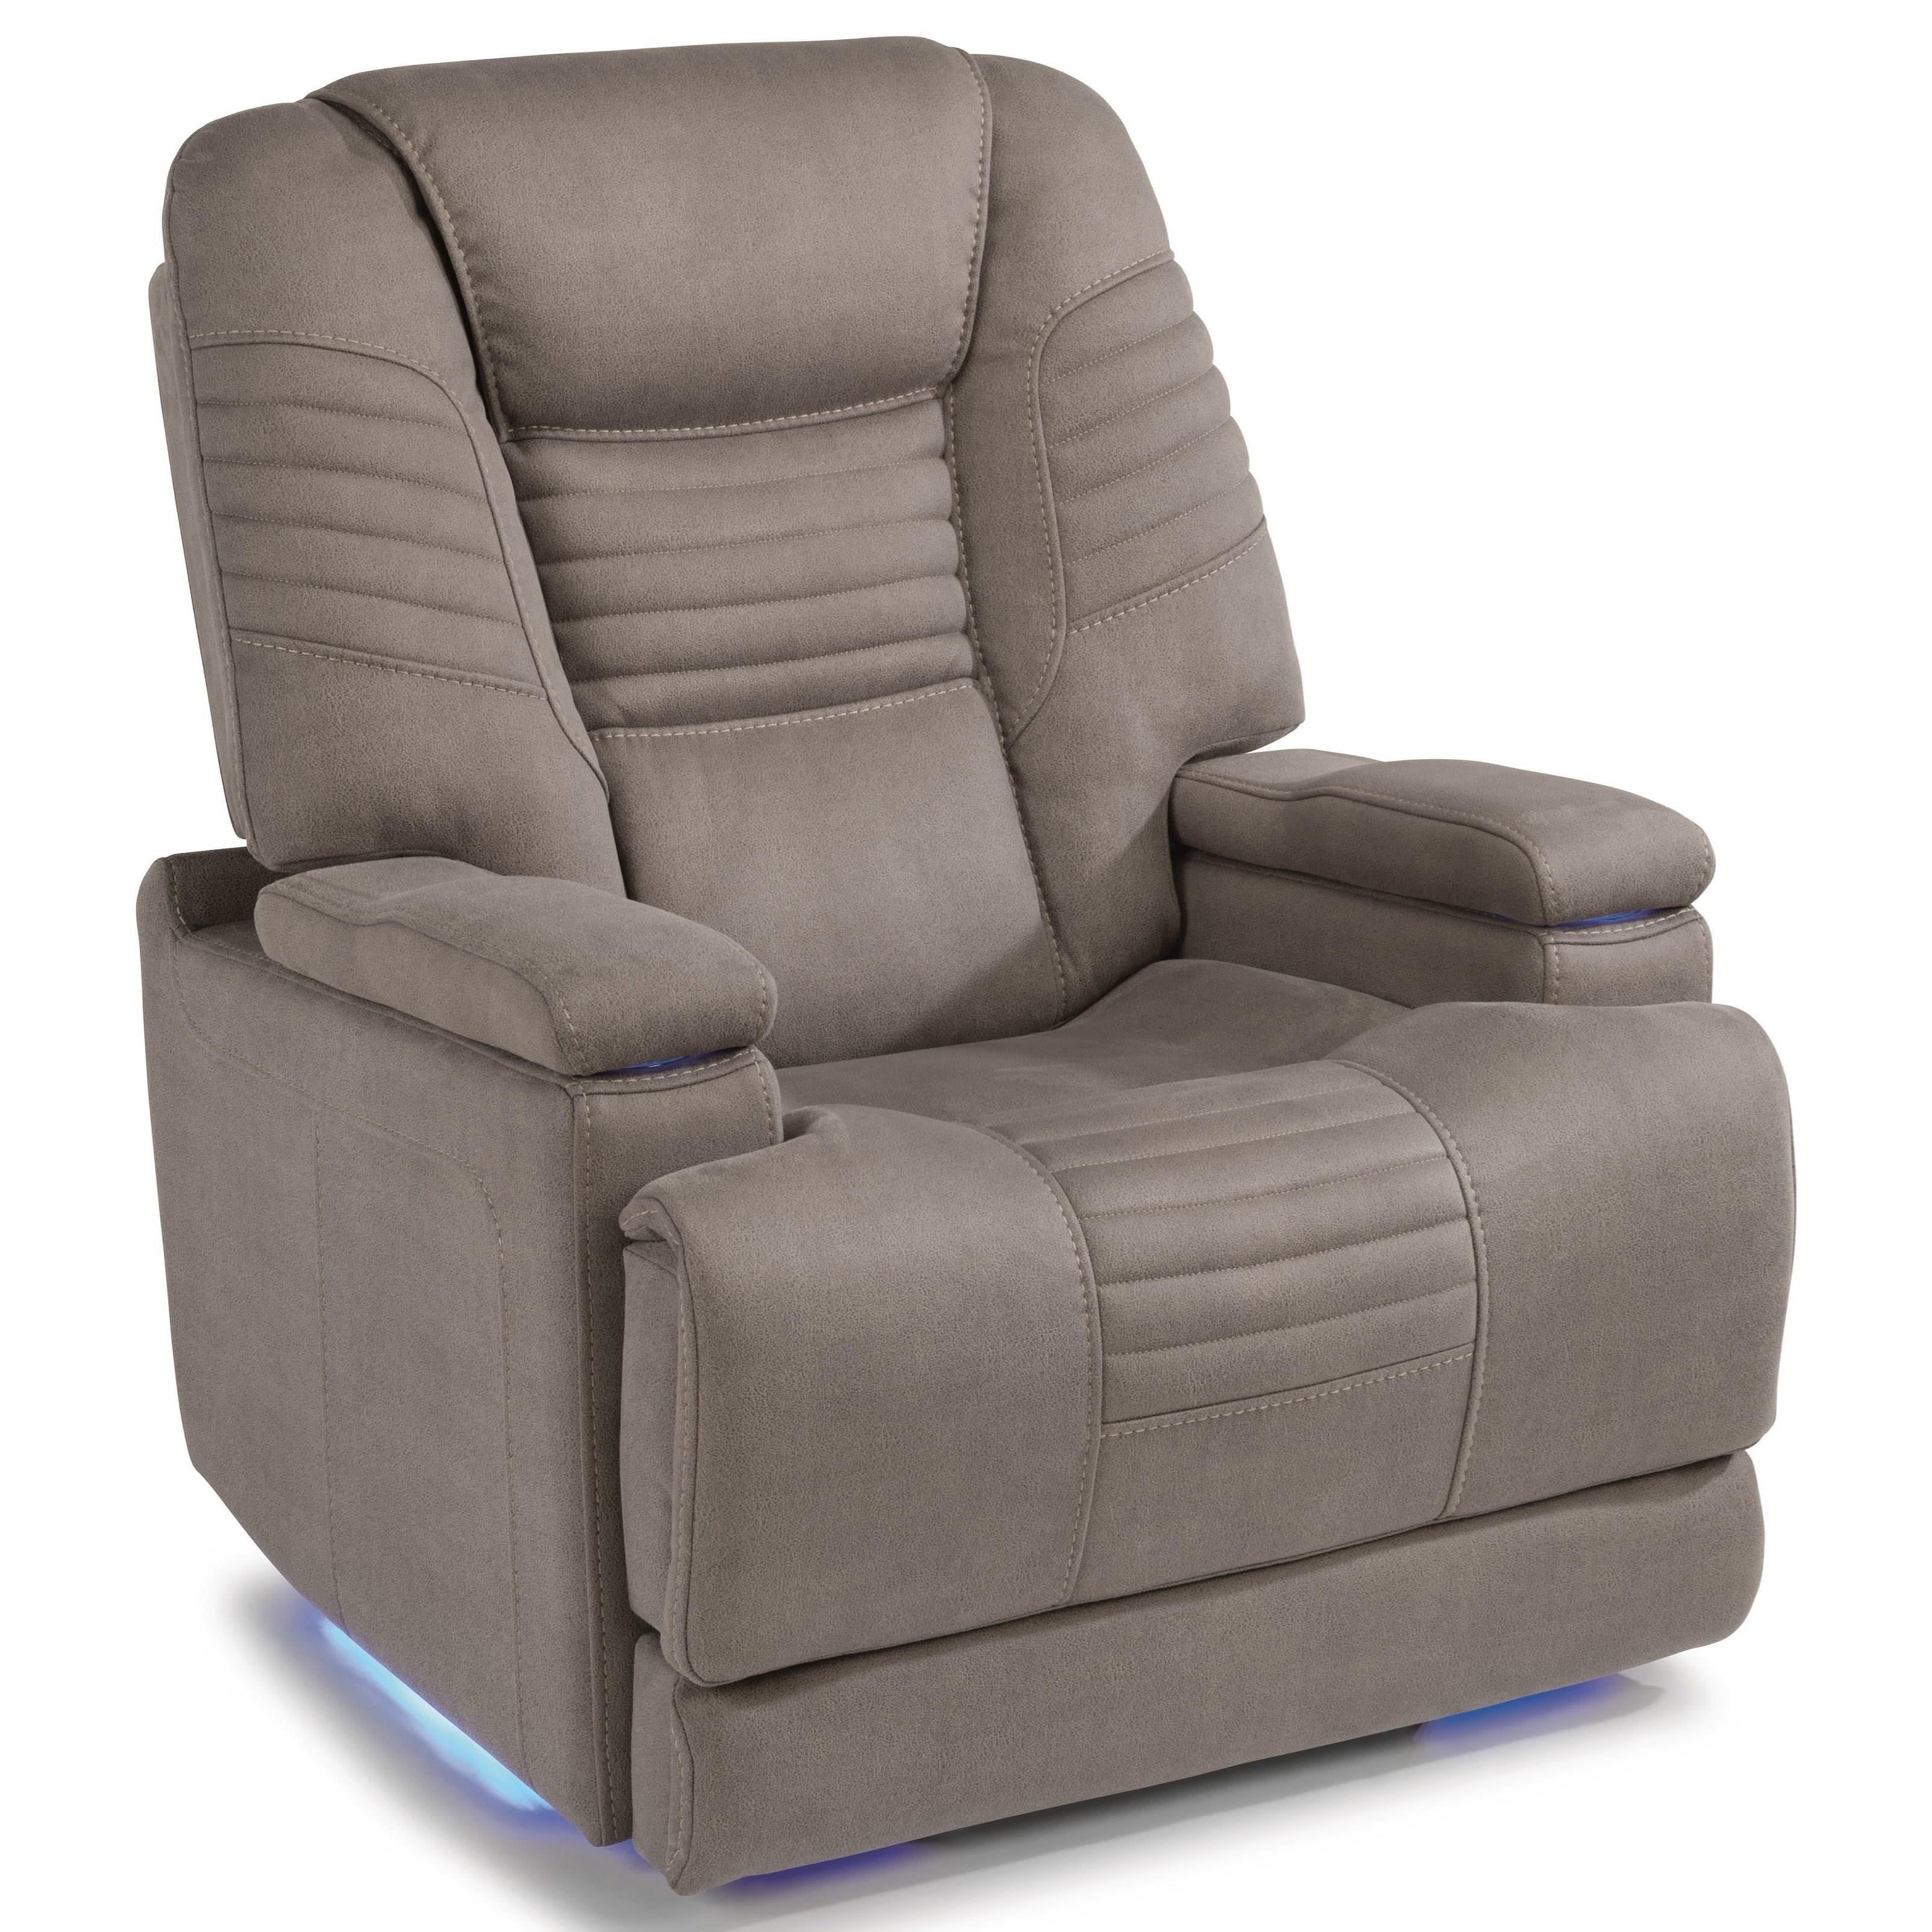 Power Layflat Recliner w/ Pwr Headrest